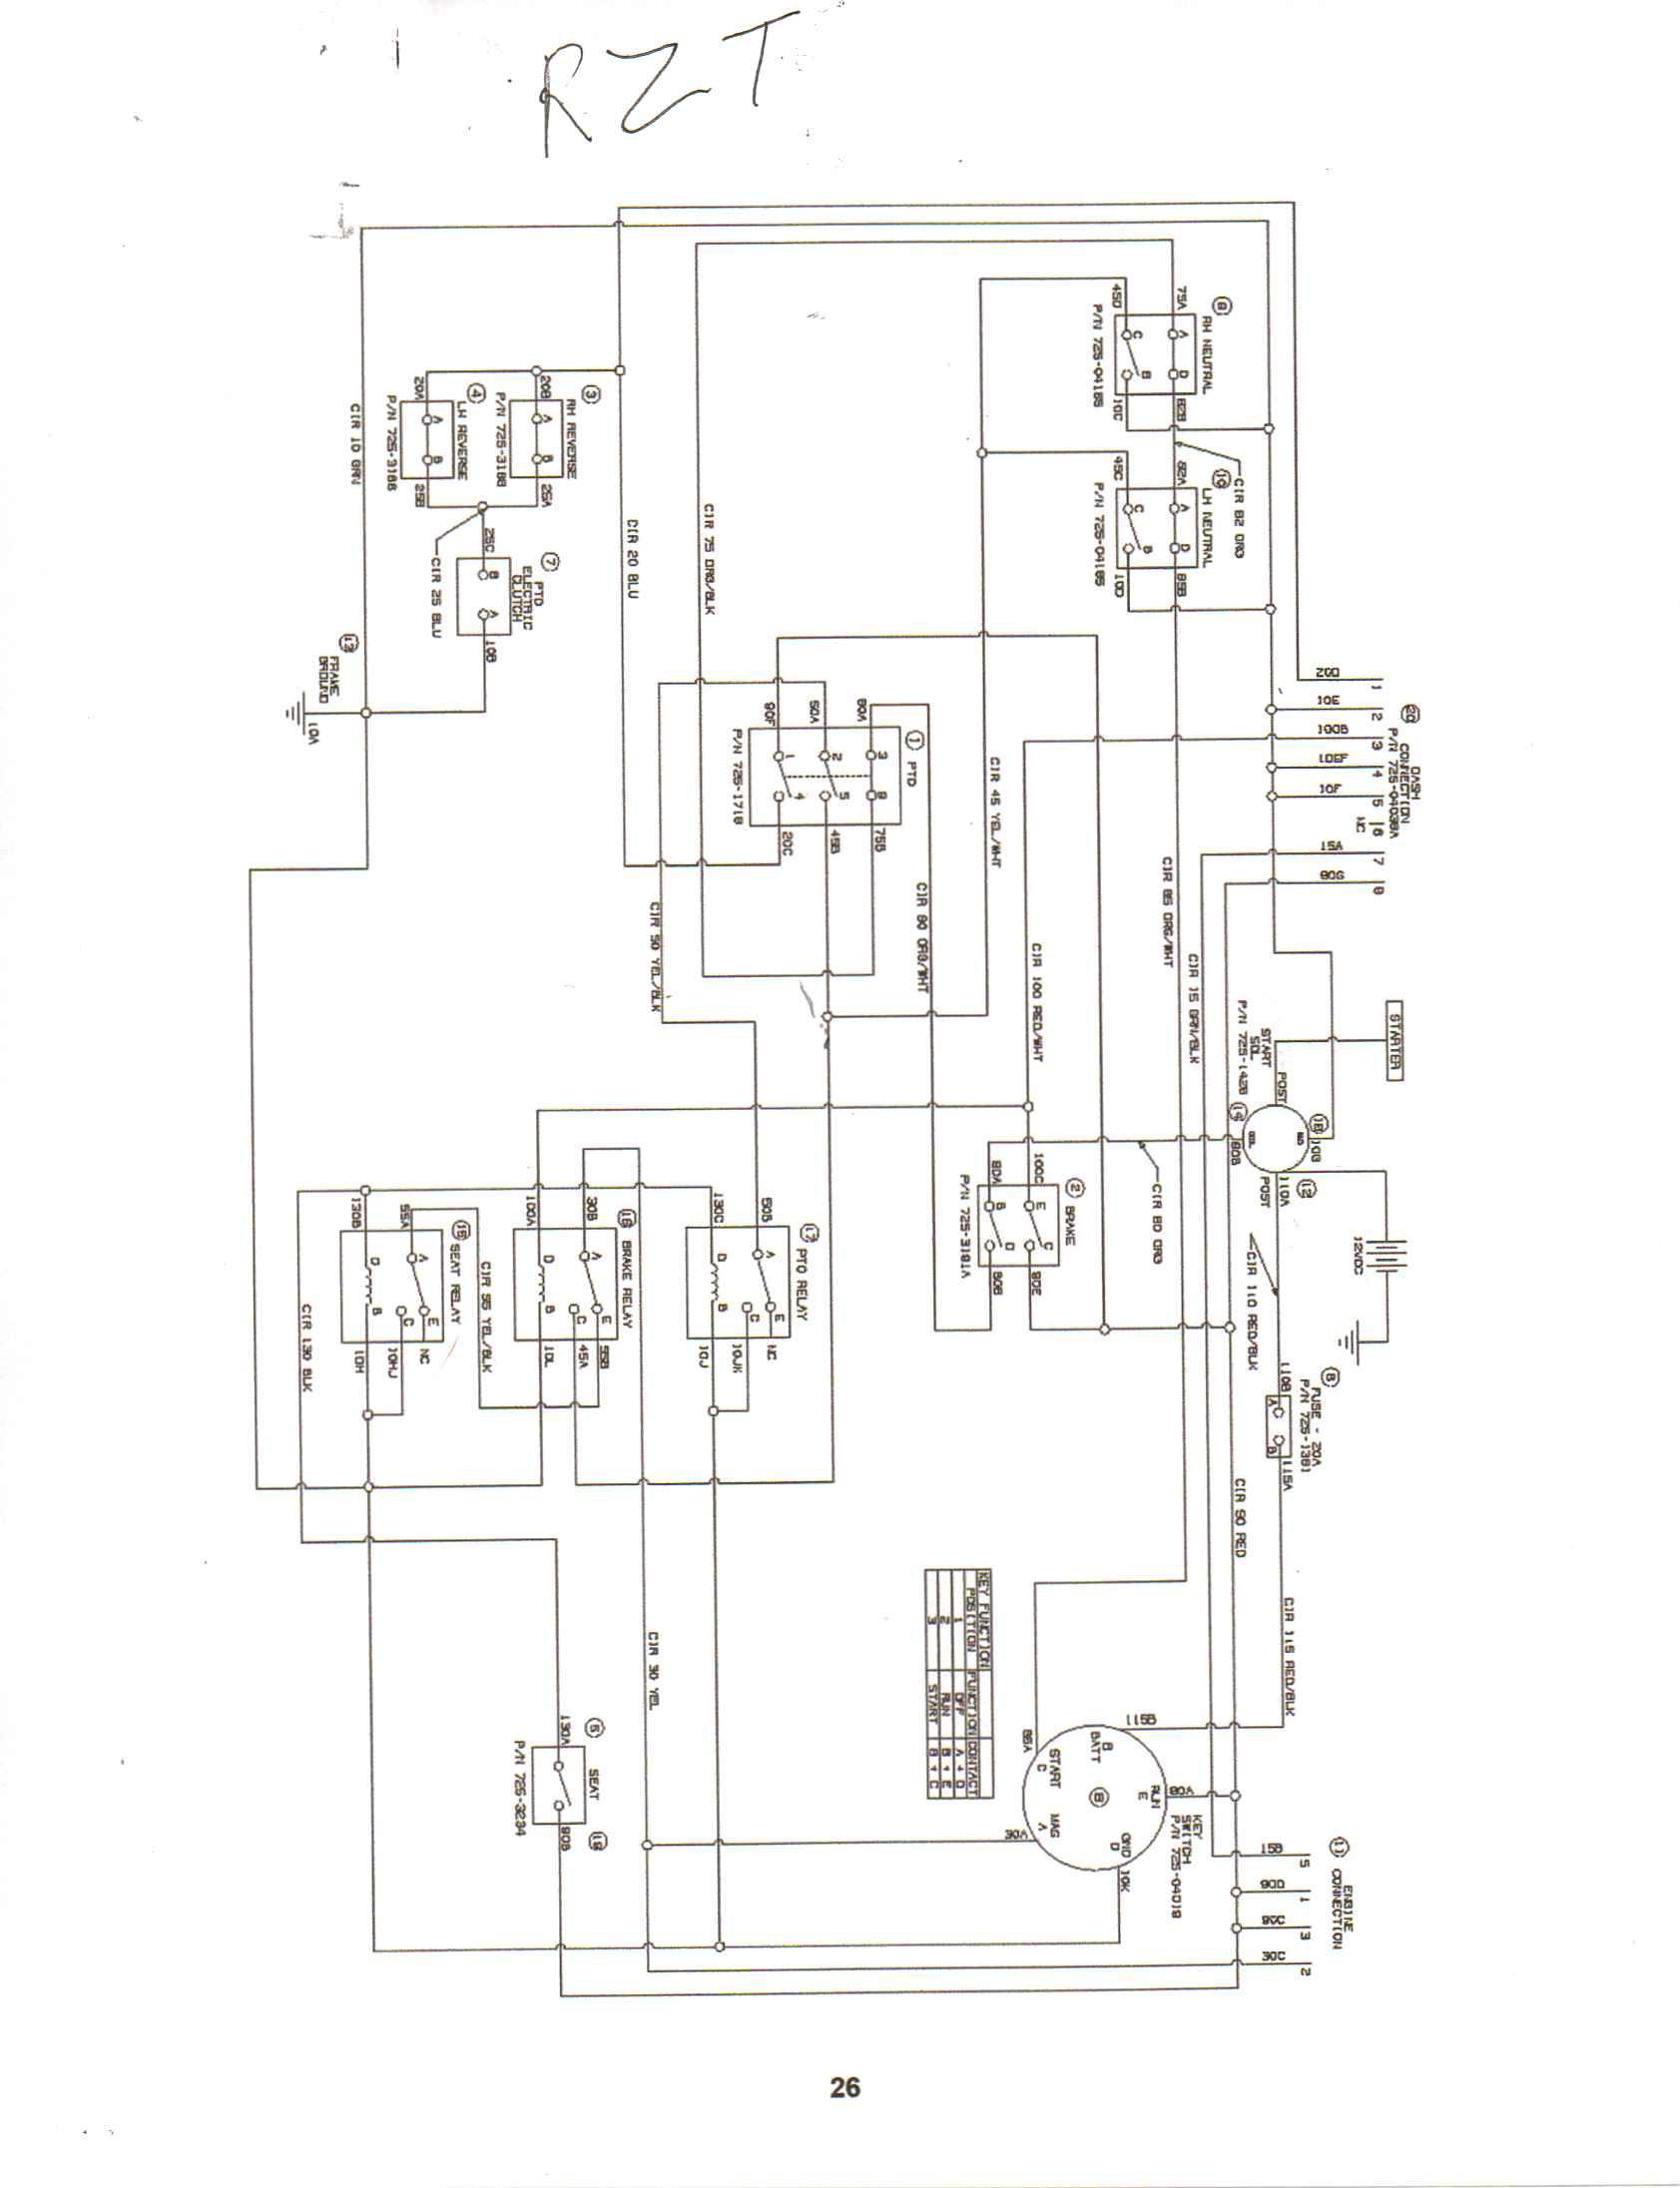 Cub Cadet Rzt Series Tractor Wiring Diagram